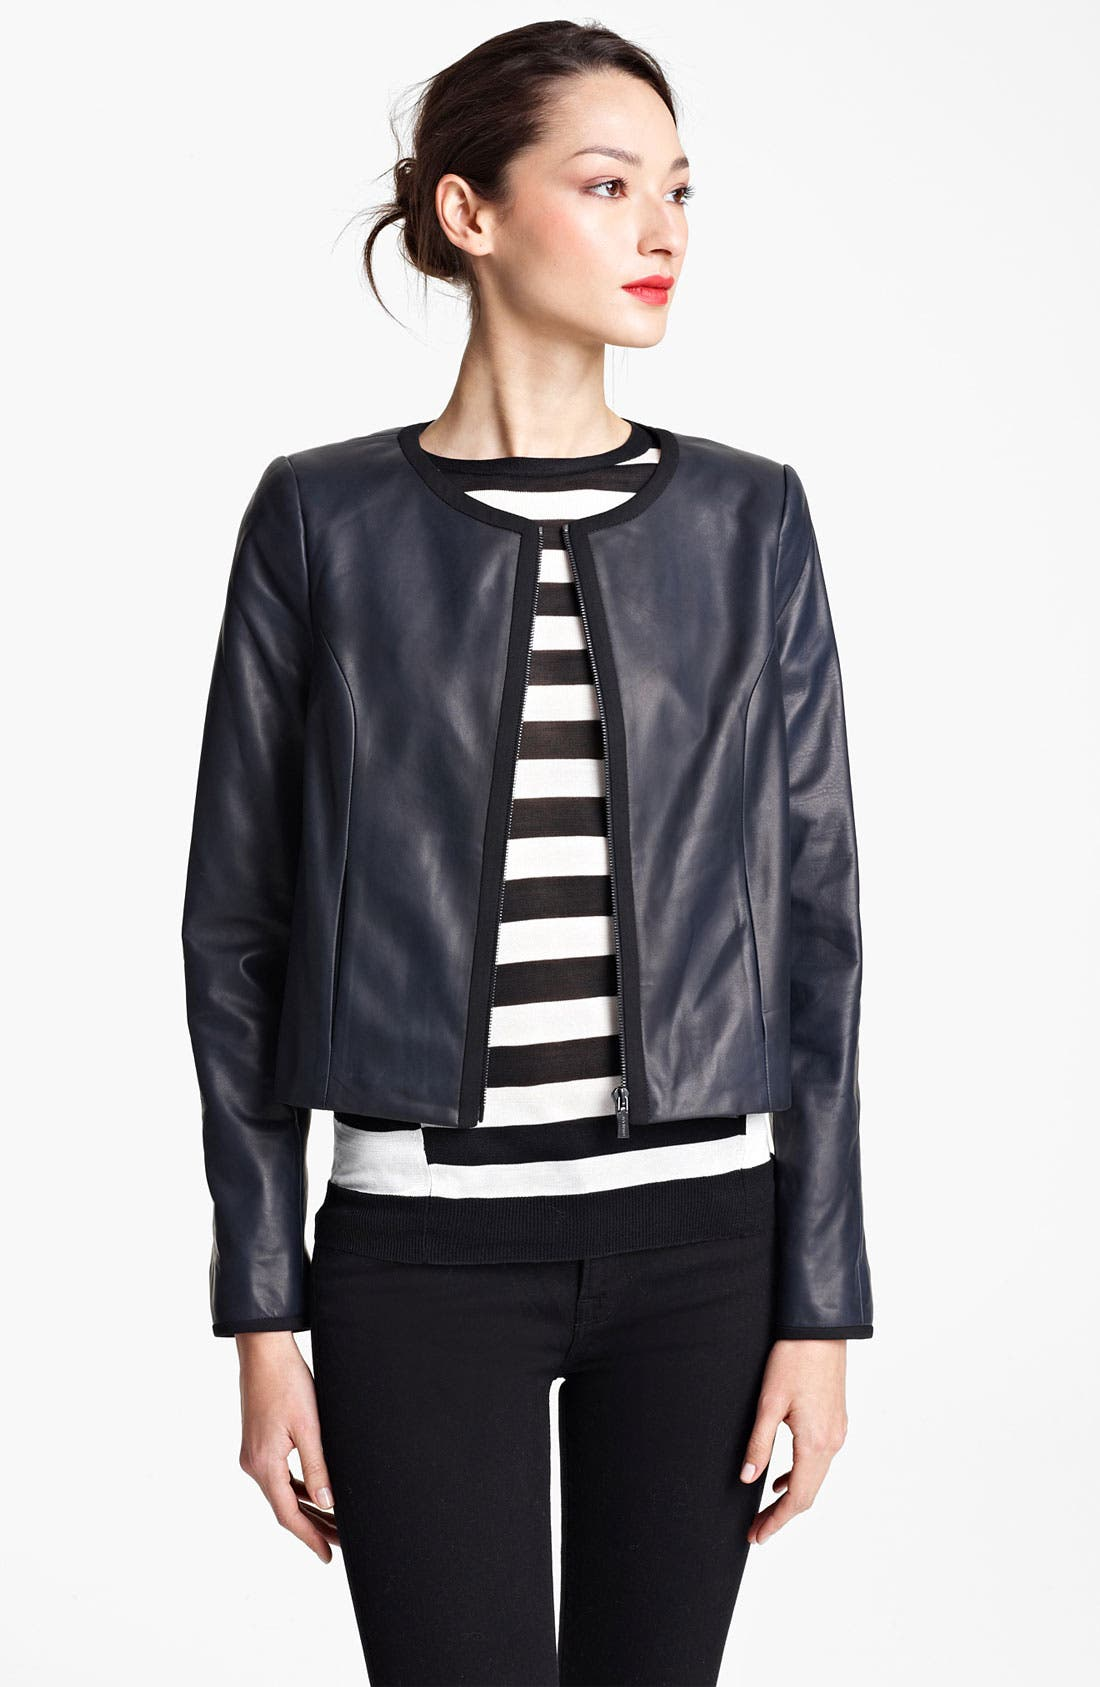 Main Image - Jason Wu Nappa Leather Jacket